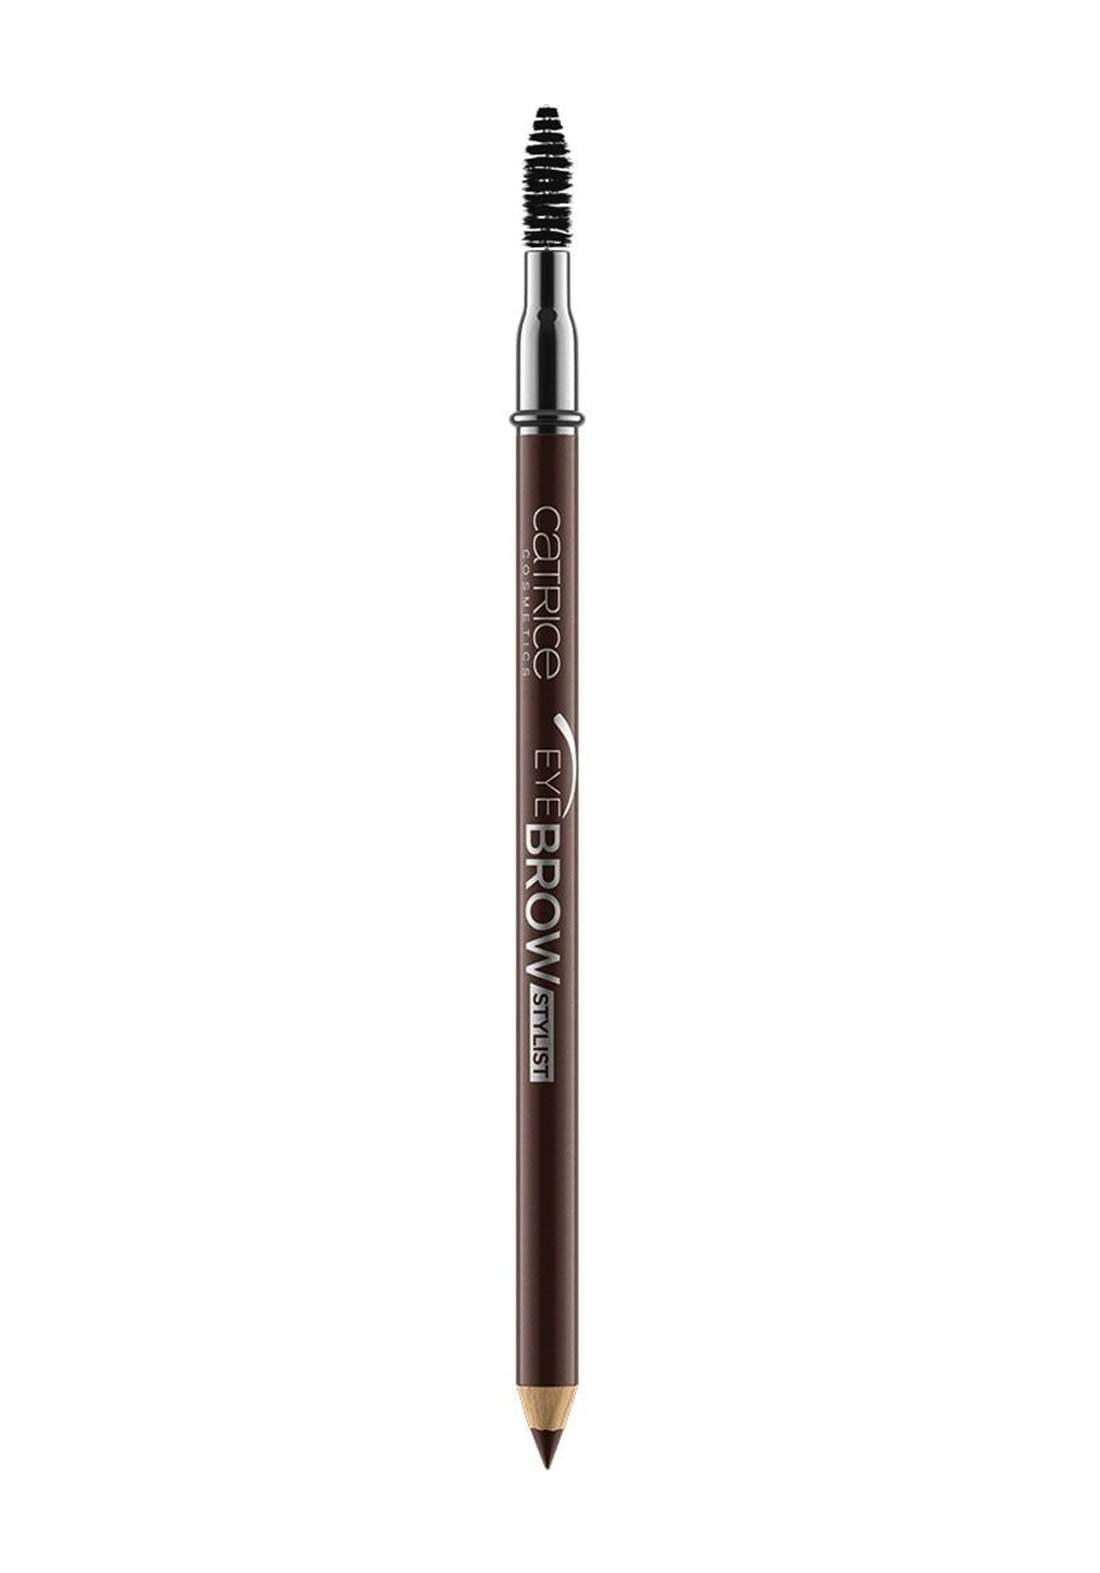 Catrice Cosmetics Eye Brow Stylist - Brown قلم تحديد الحاجب